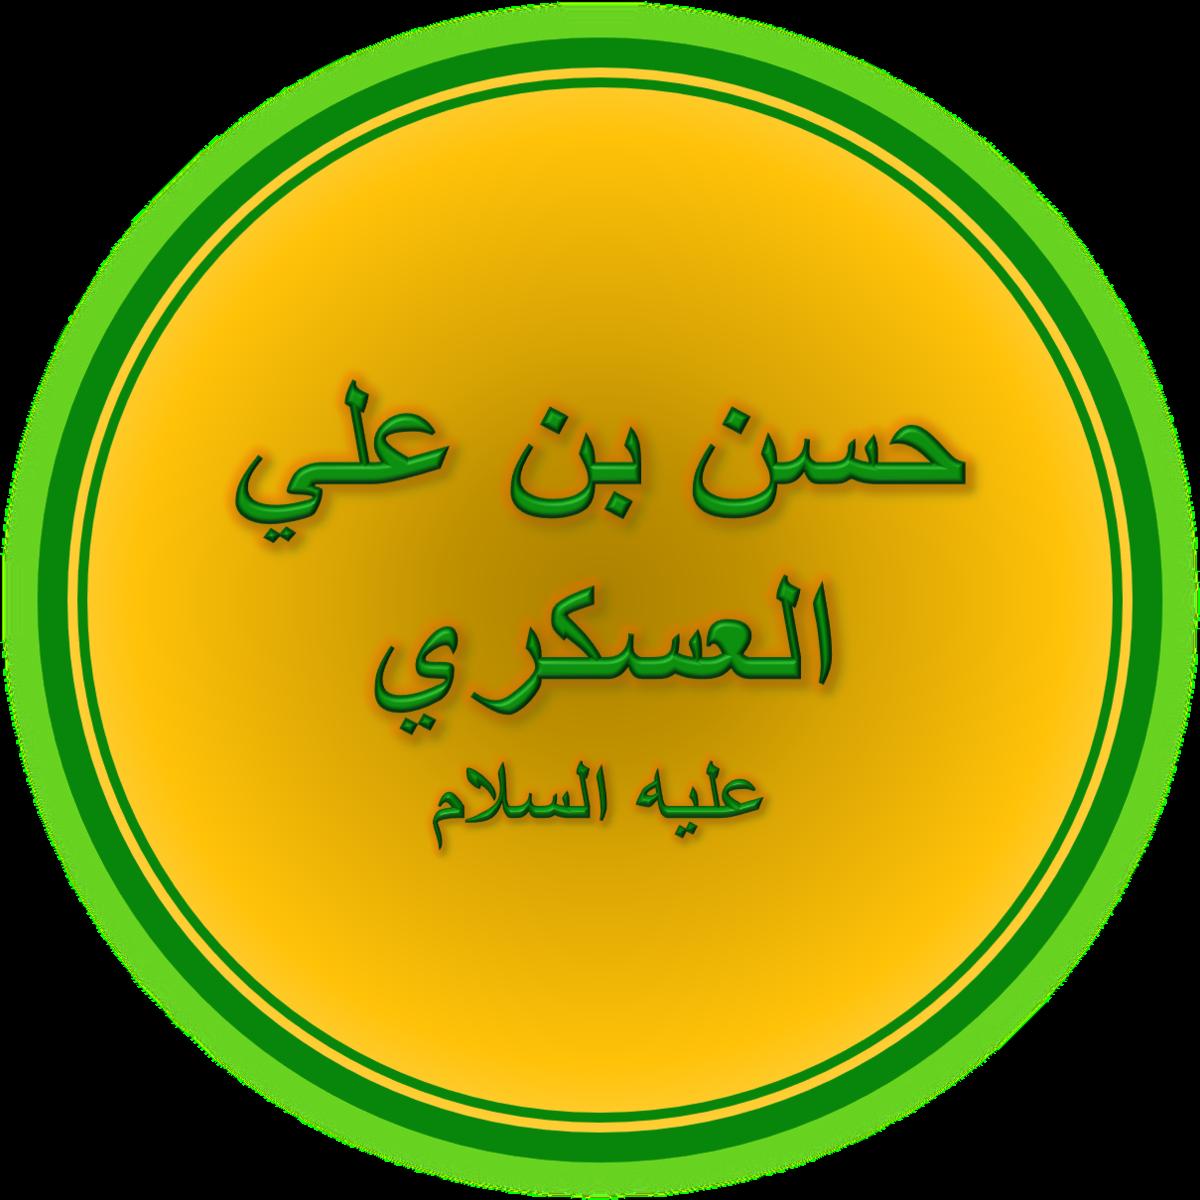 Hasan al-Askari - Wikipedia